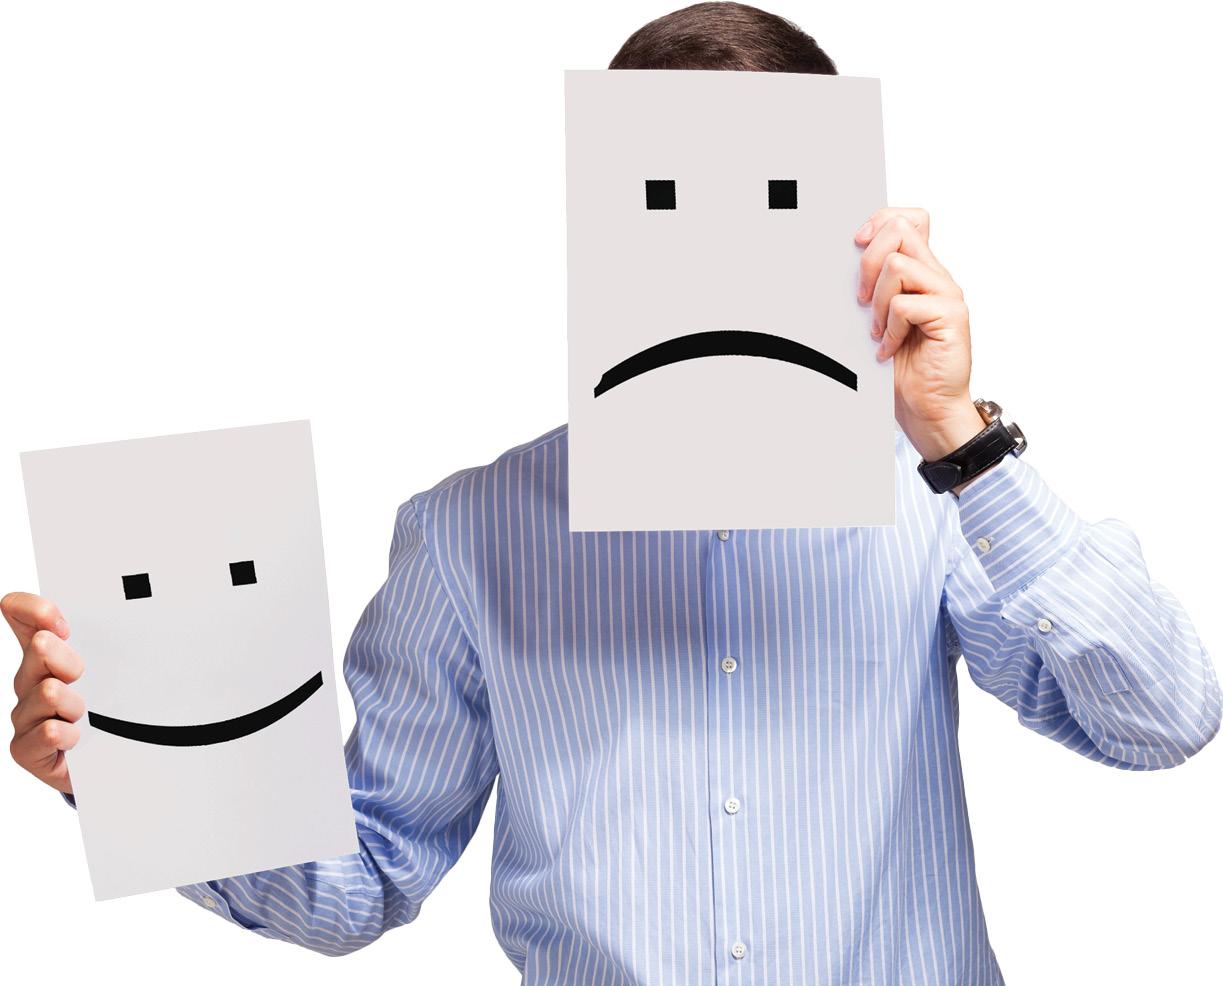 چرا اکثر اوقات منفیبافی میکنیم؟